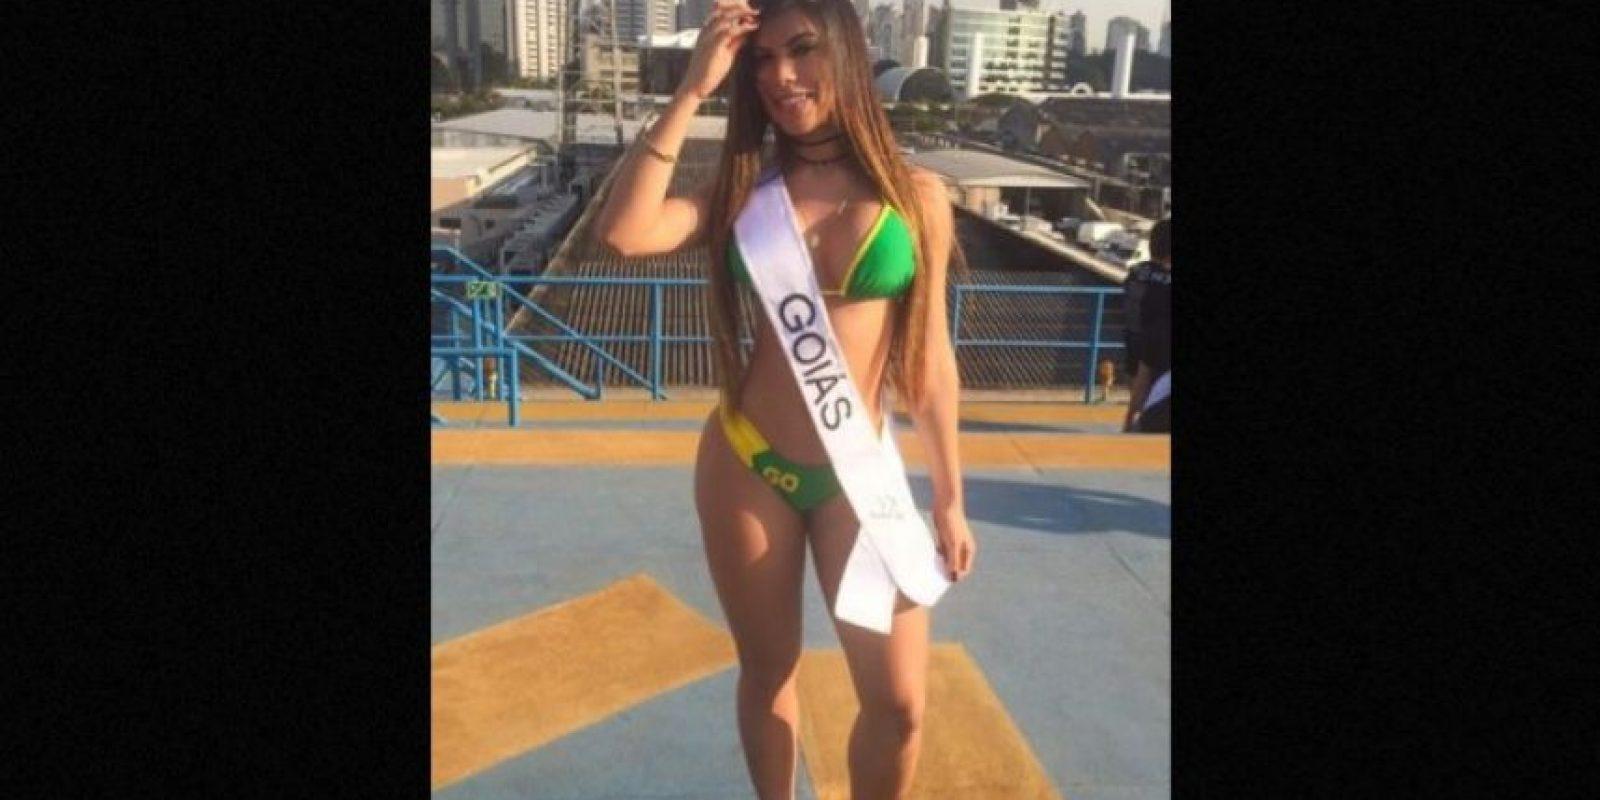 Priscila Rocha de Goiás Foto:Instagram/priscilarochaoficial